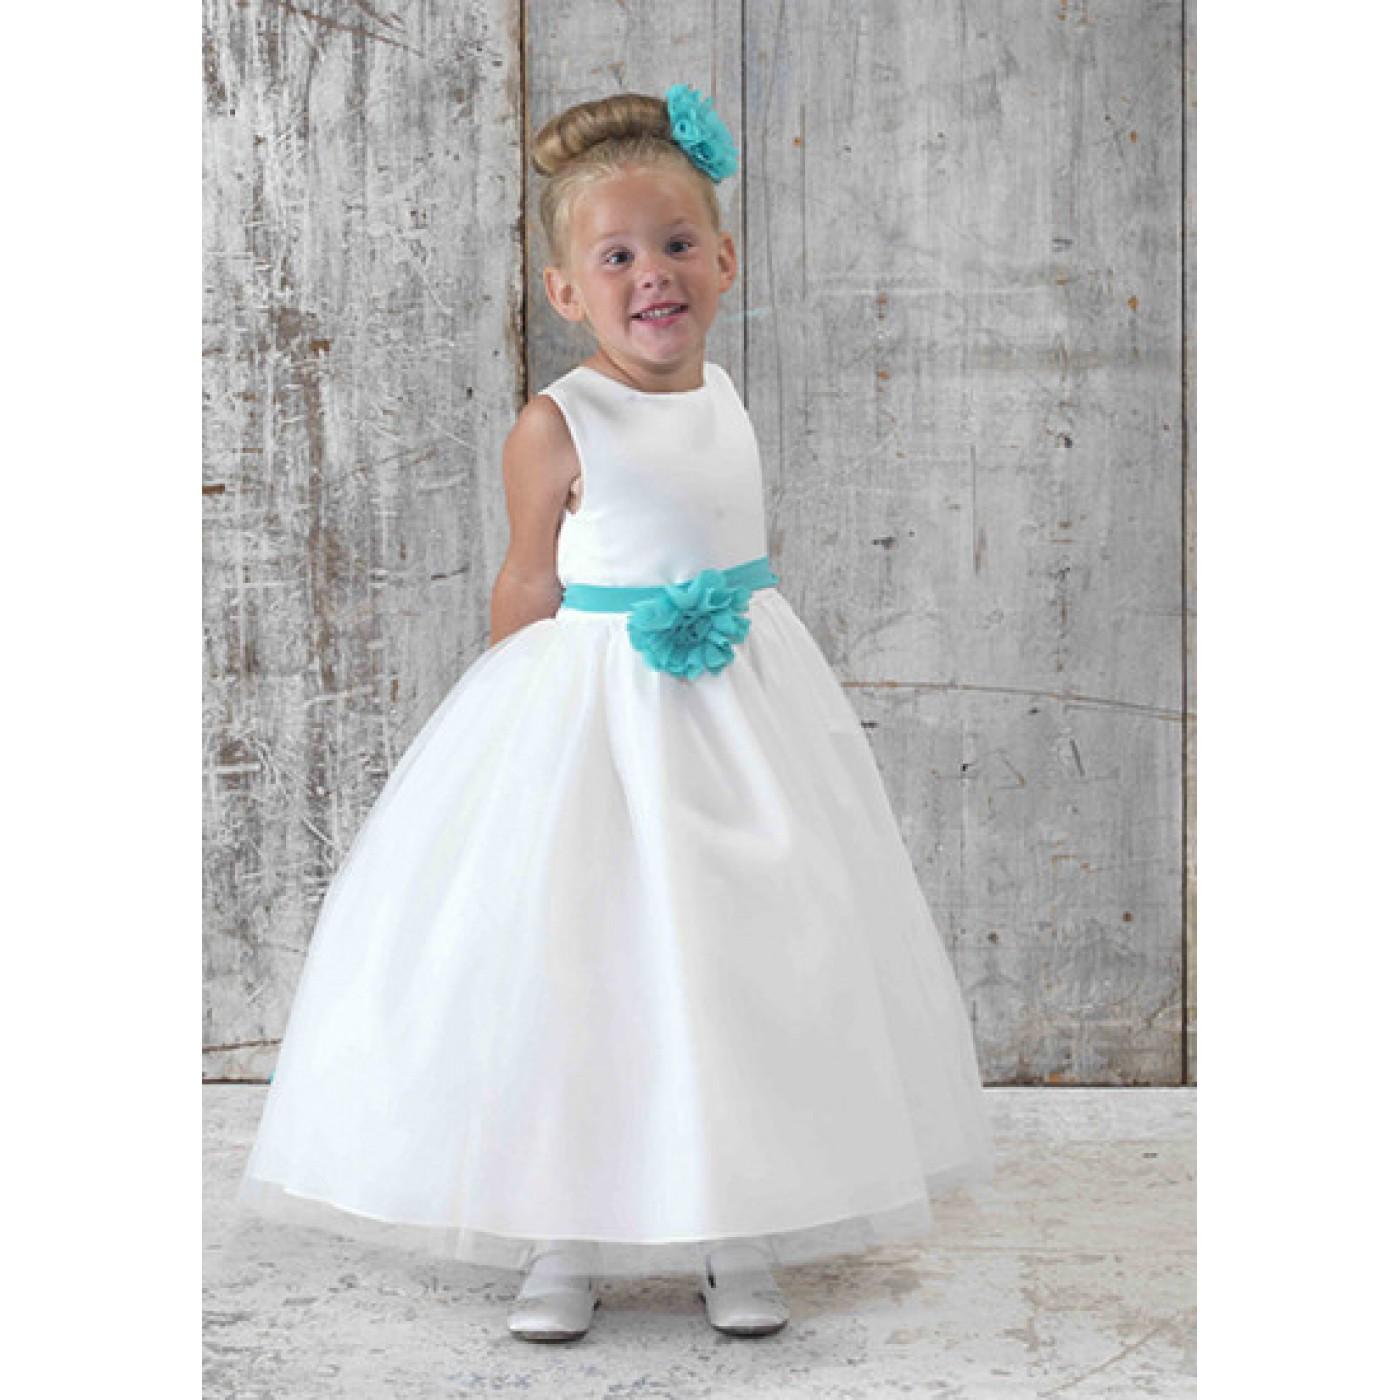 Linzi jay fl600 flower girl dress the dressy dress shop linzi jay fl600 flower girl dress ombrellifo Images